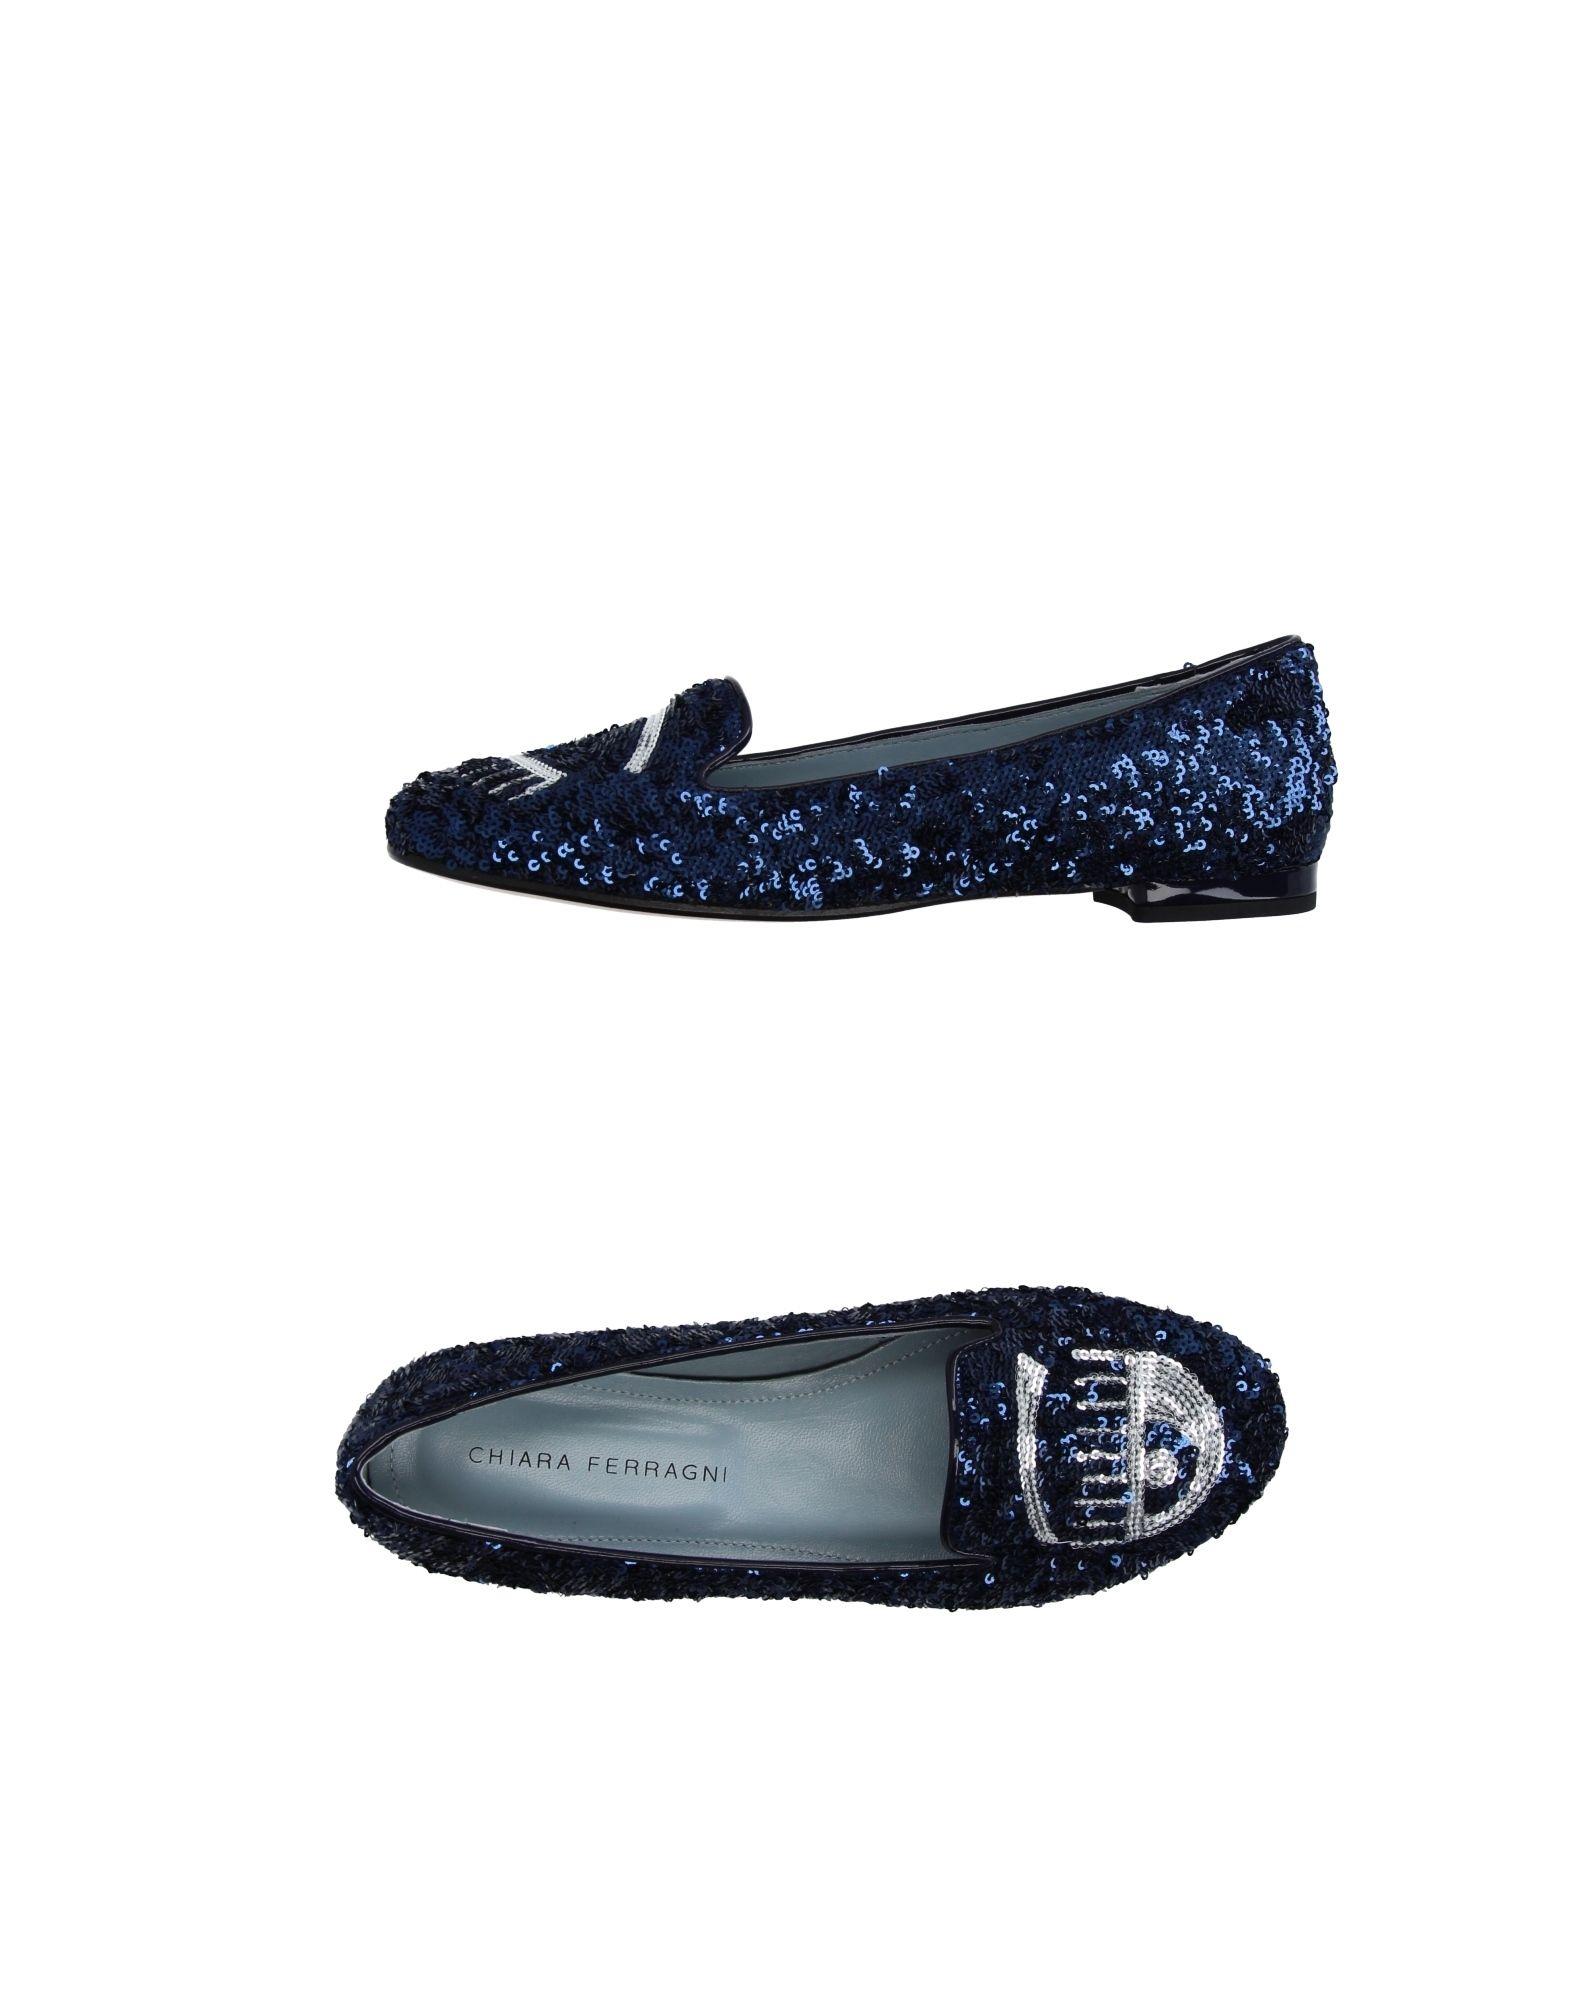 Stilvolle Mokassins billige Schuhe Chiara Ferragni Mokassins Stilvolle Damen  11215217GI 7c99da